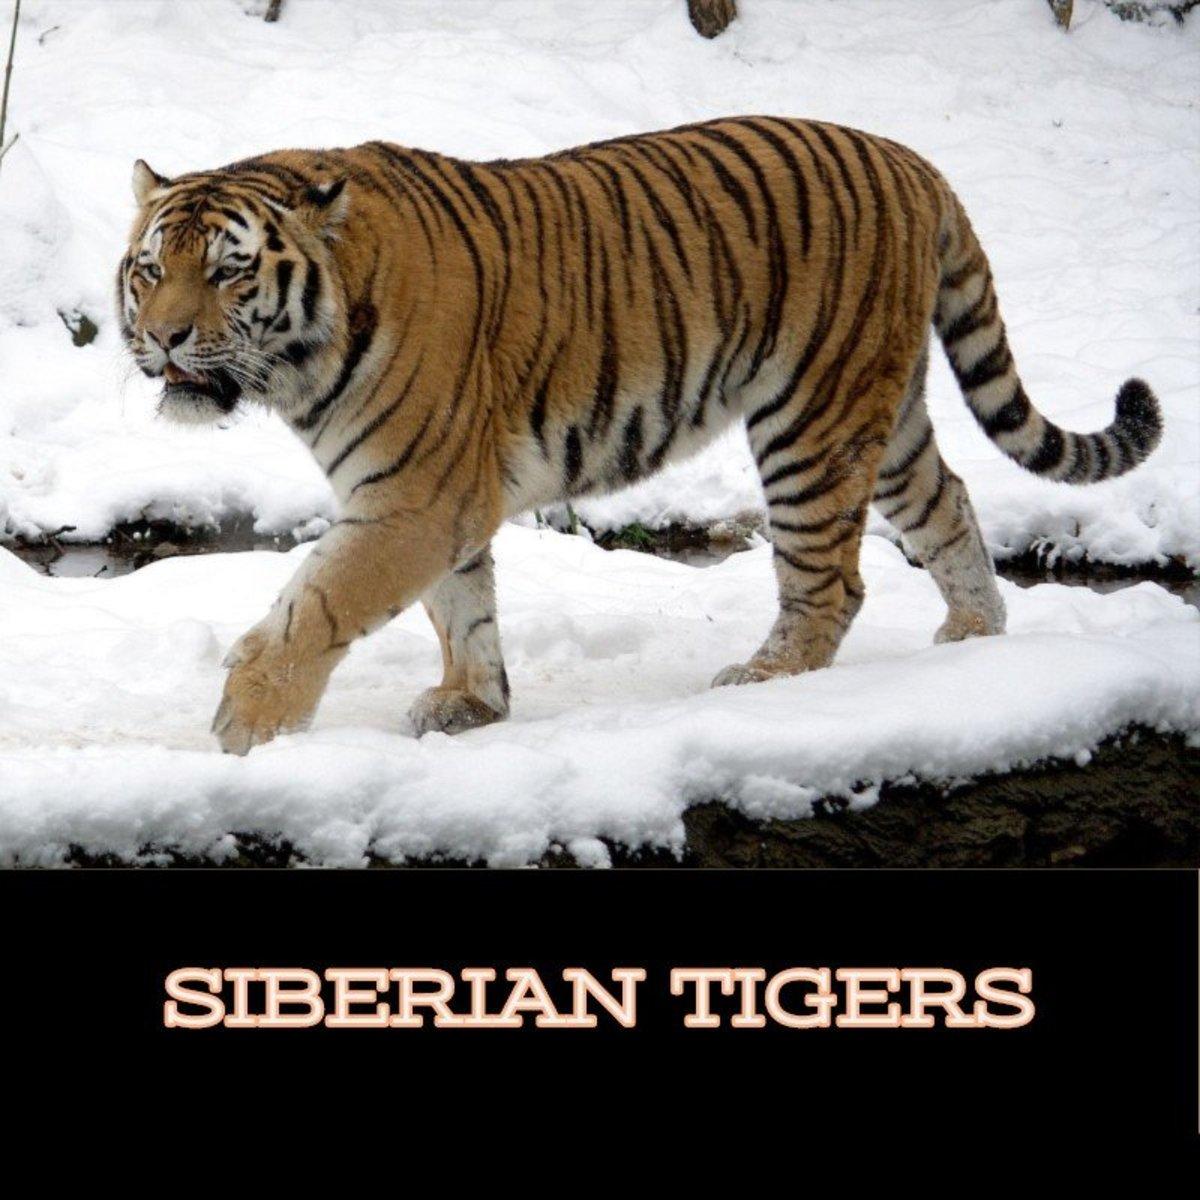 Siberian Tiger in its natural habitat.